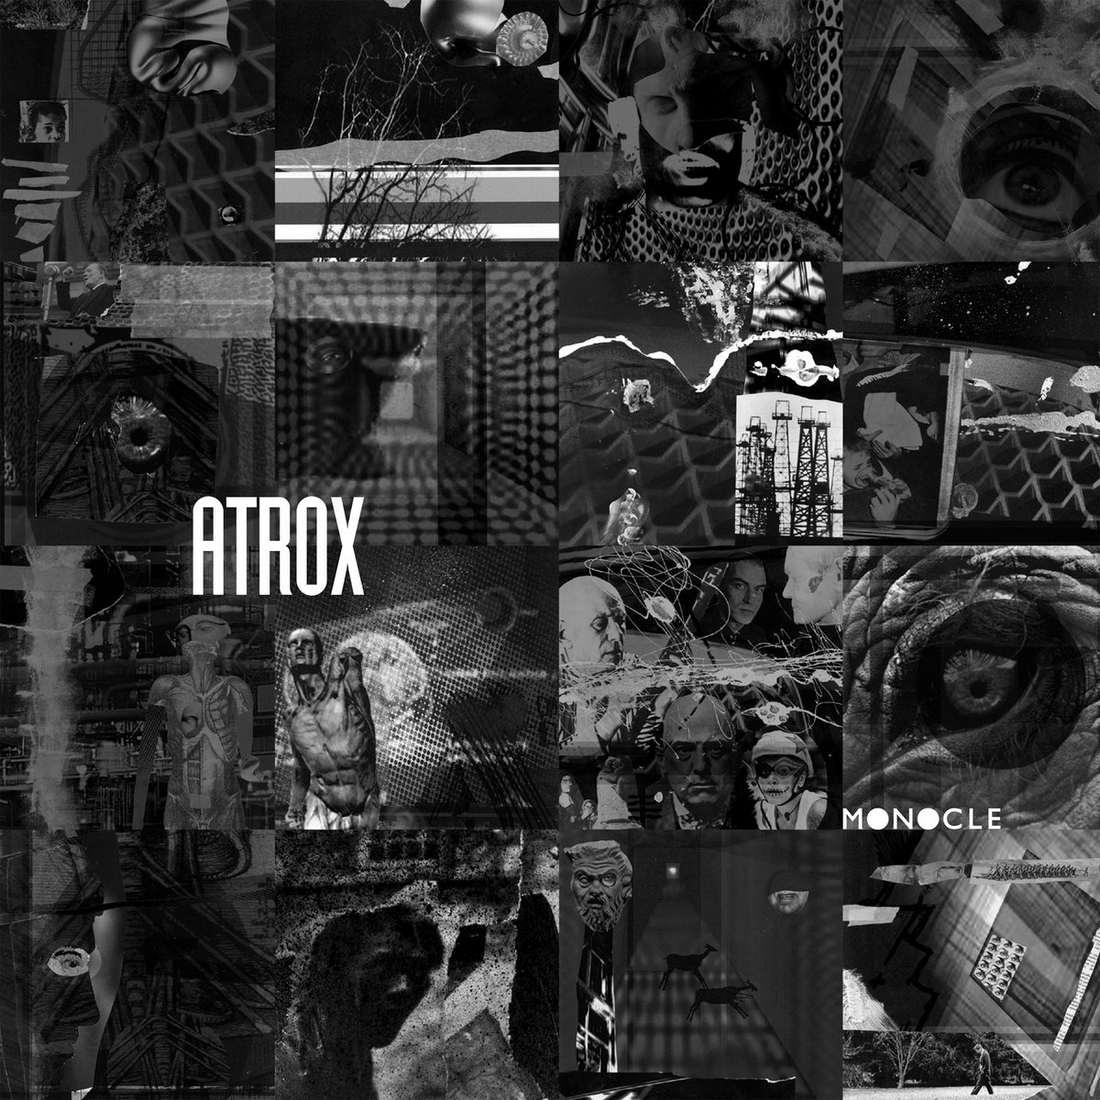 Atrox: Monocle (2017) Book Cover